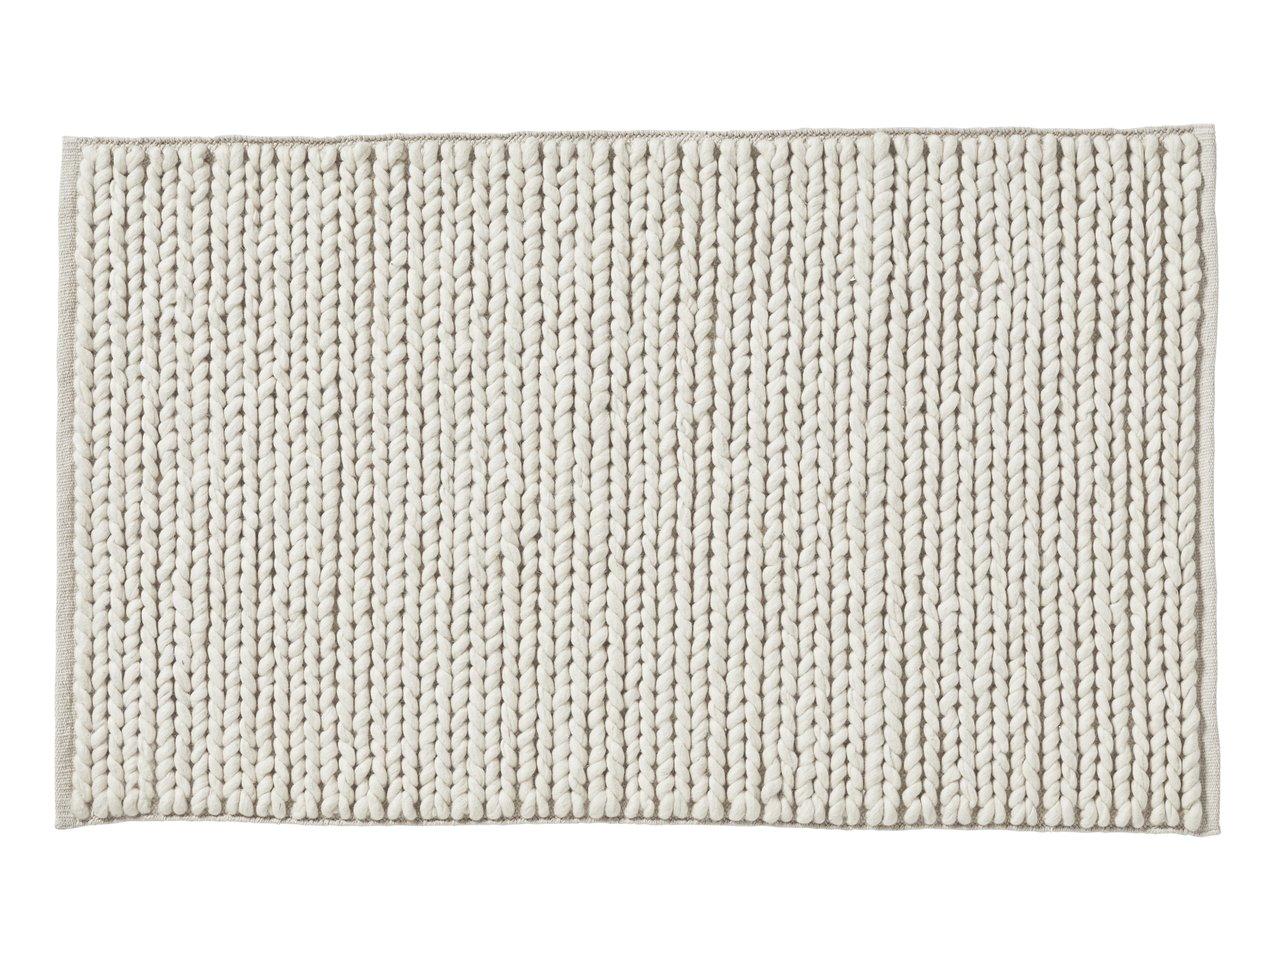 braided-wool-rug-ivory-lp-000_1280x.jpg